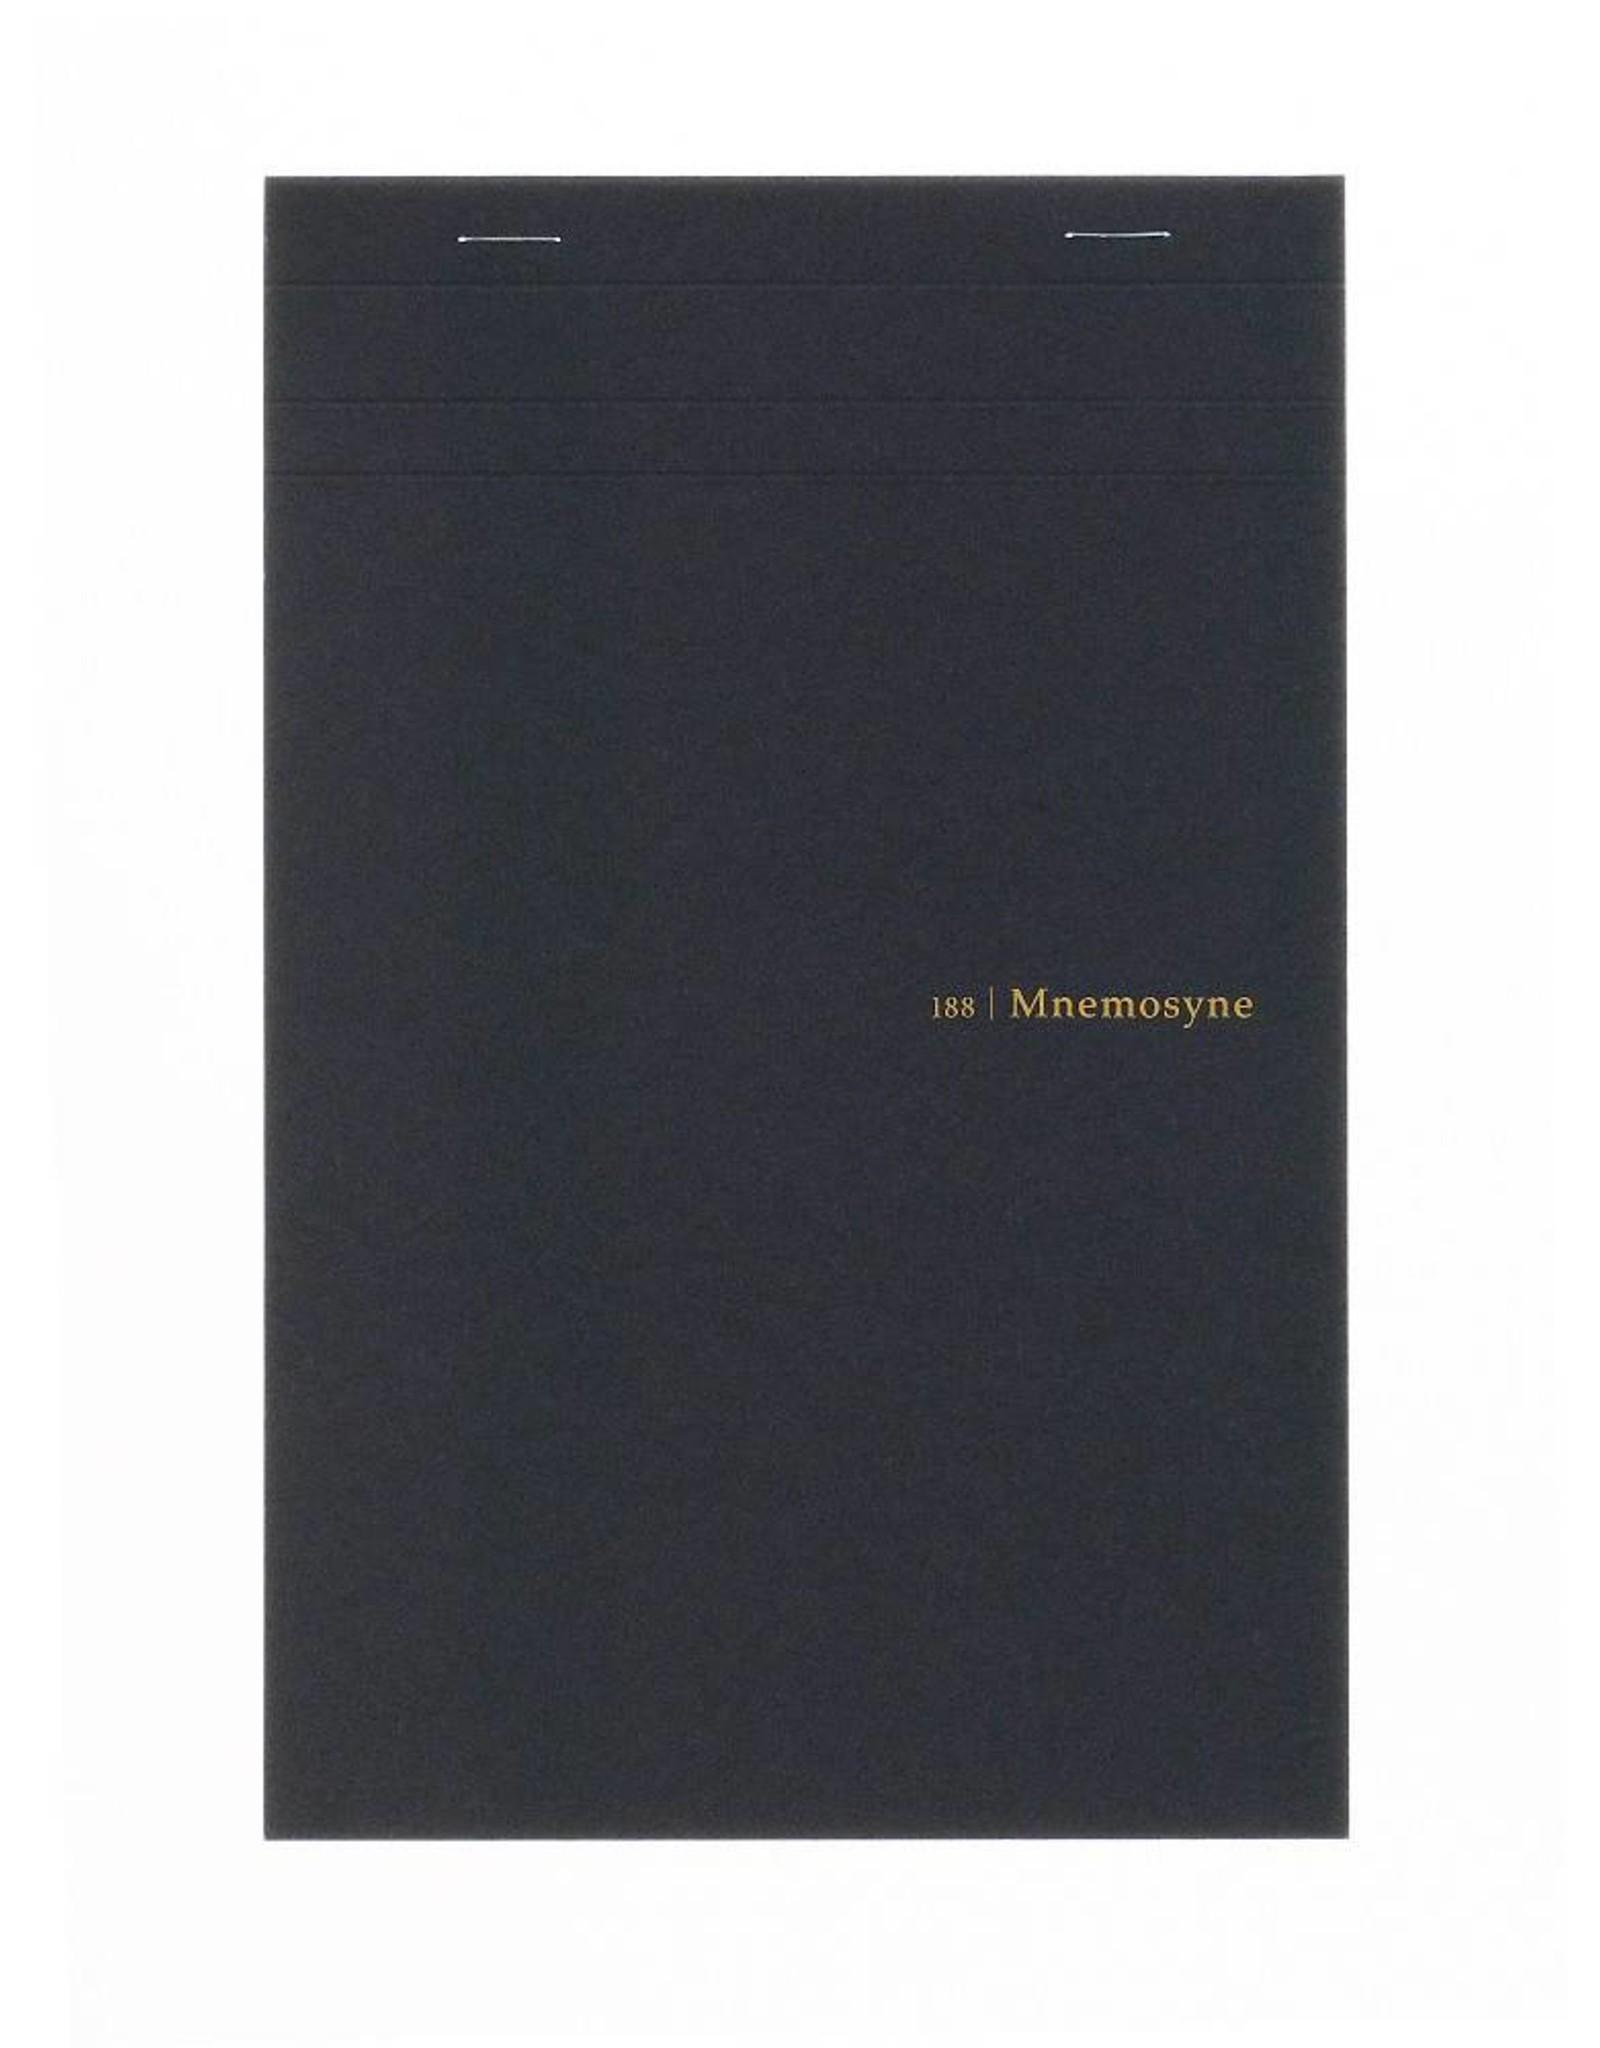 MARUMAN N188A MNEMOSYNE NOTEPAD 5MM SQUARED A5